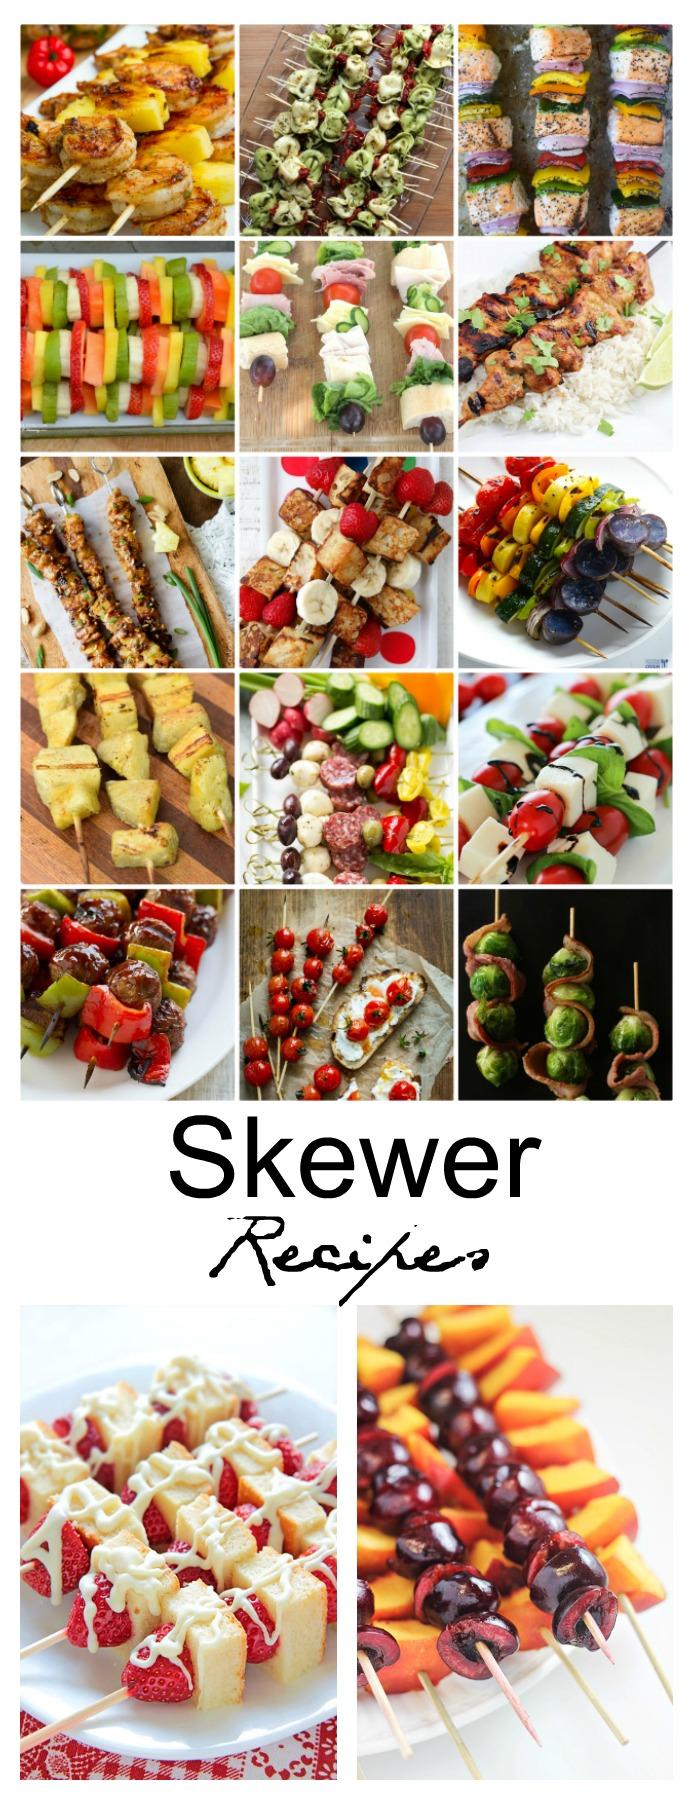 Steak Kabob Recipes Food Network